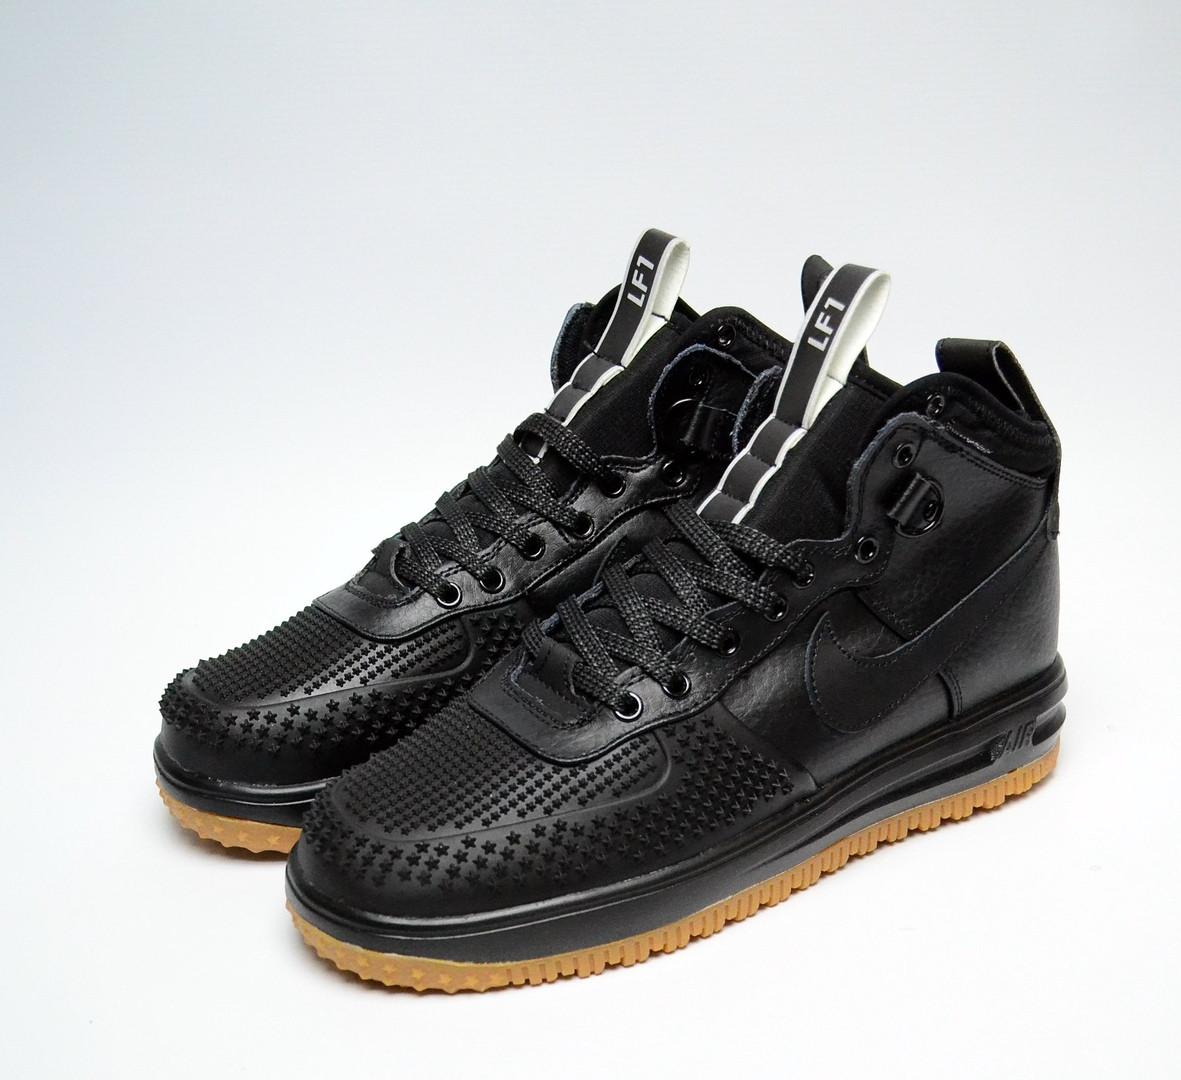 db23132a Зимние мужские кроссовки Nike Air Lunar Force Duckboot Black ...